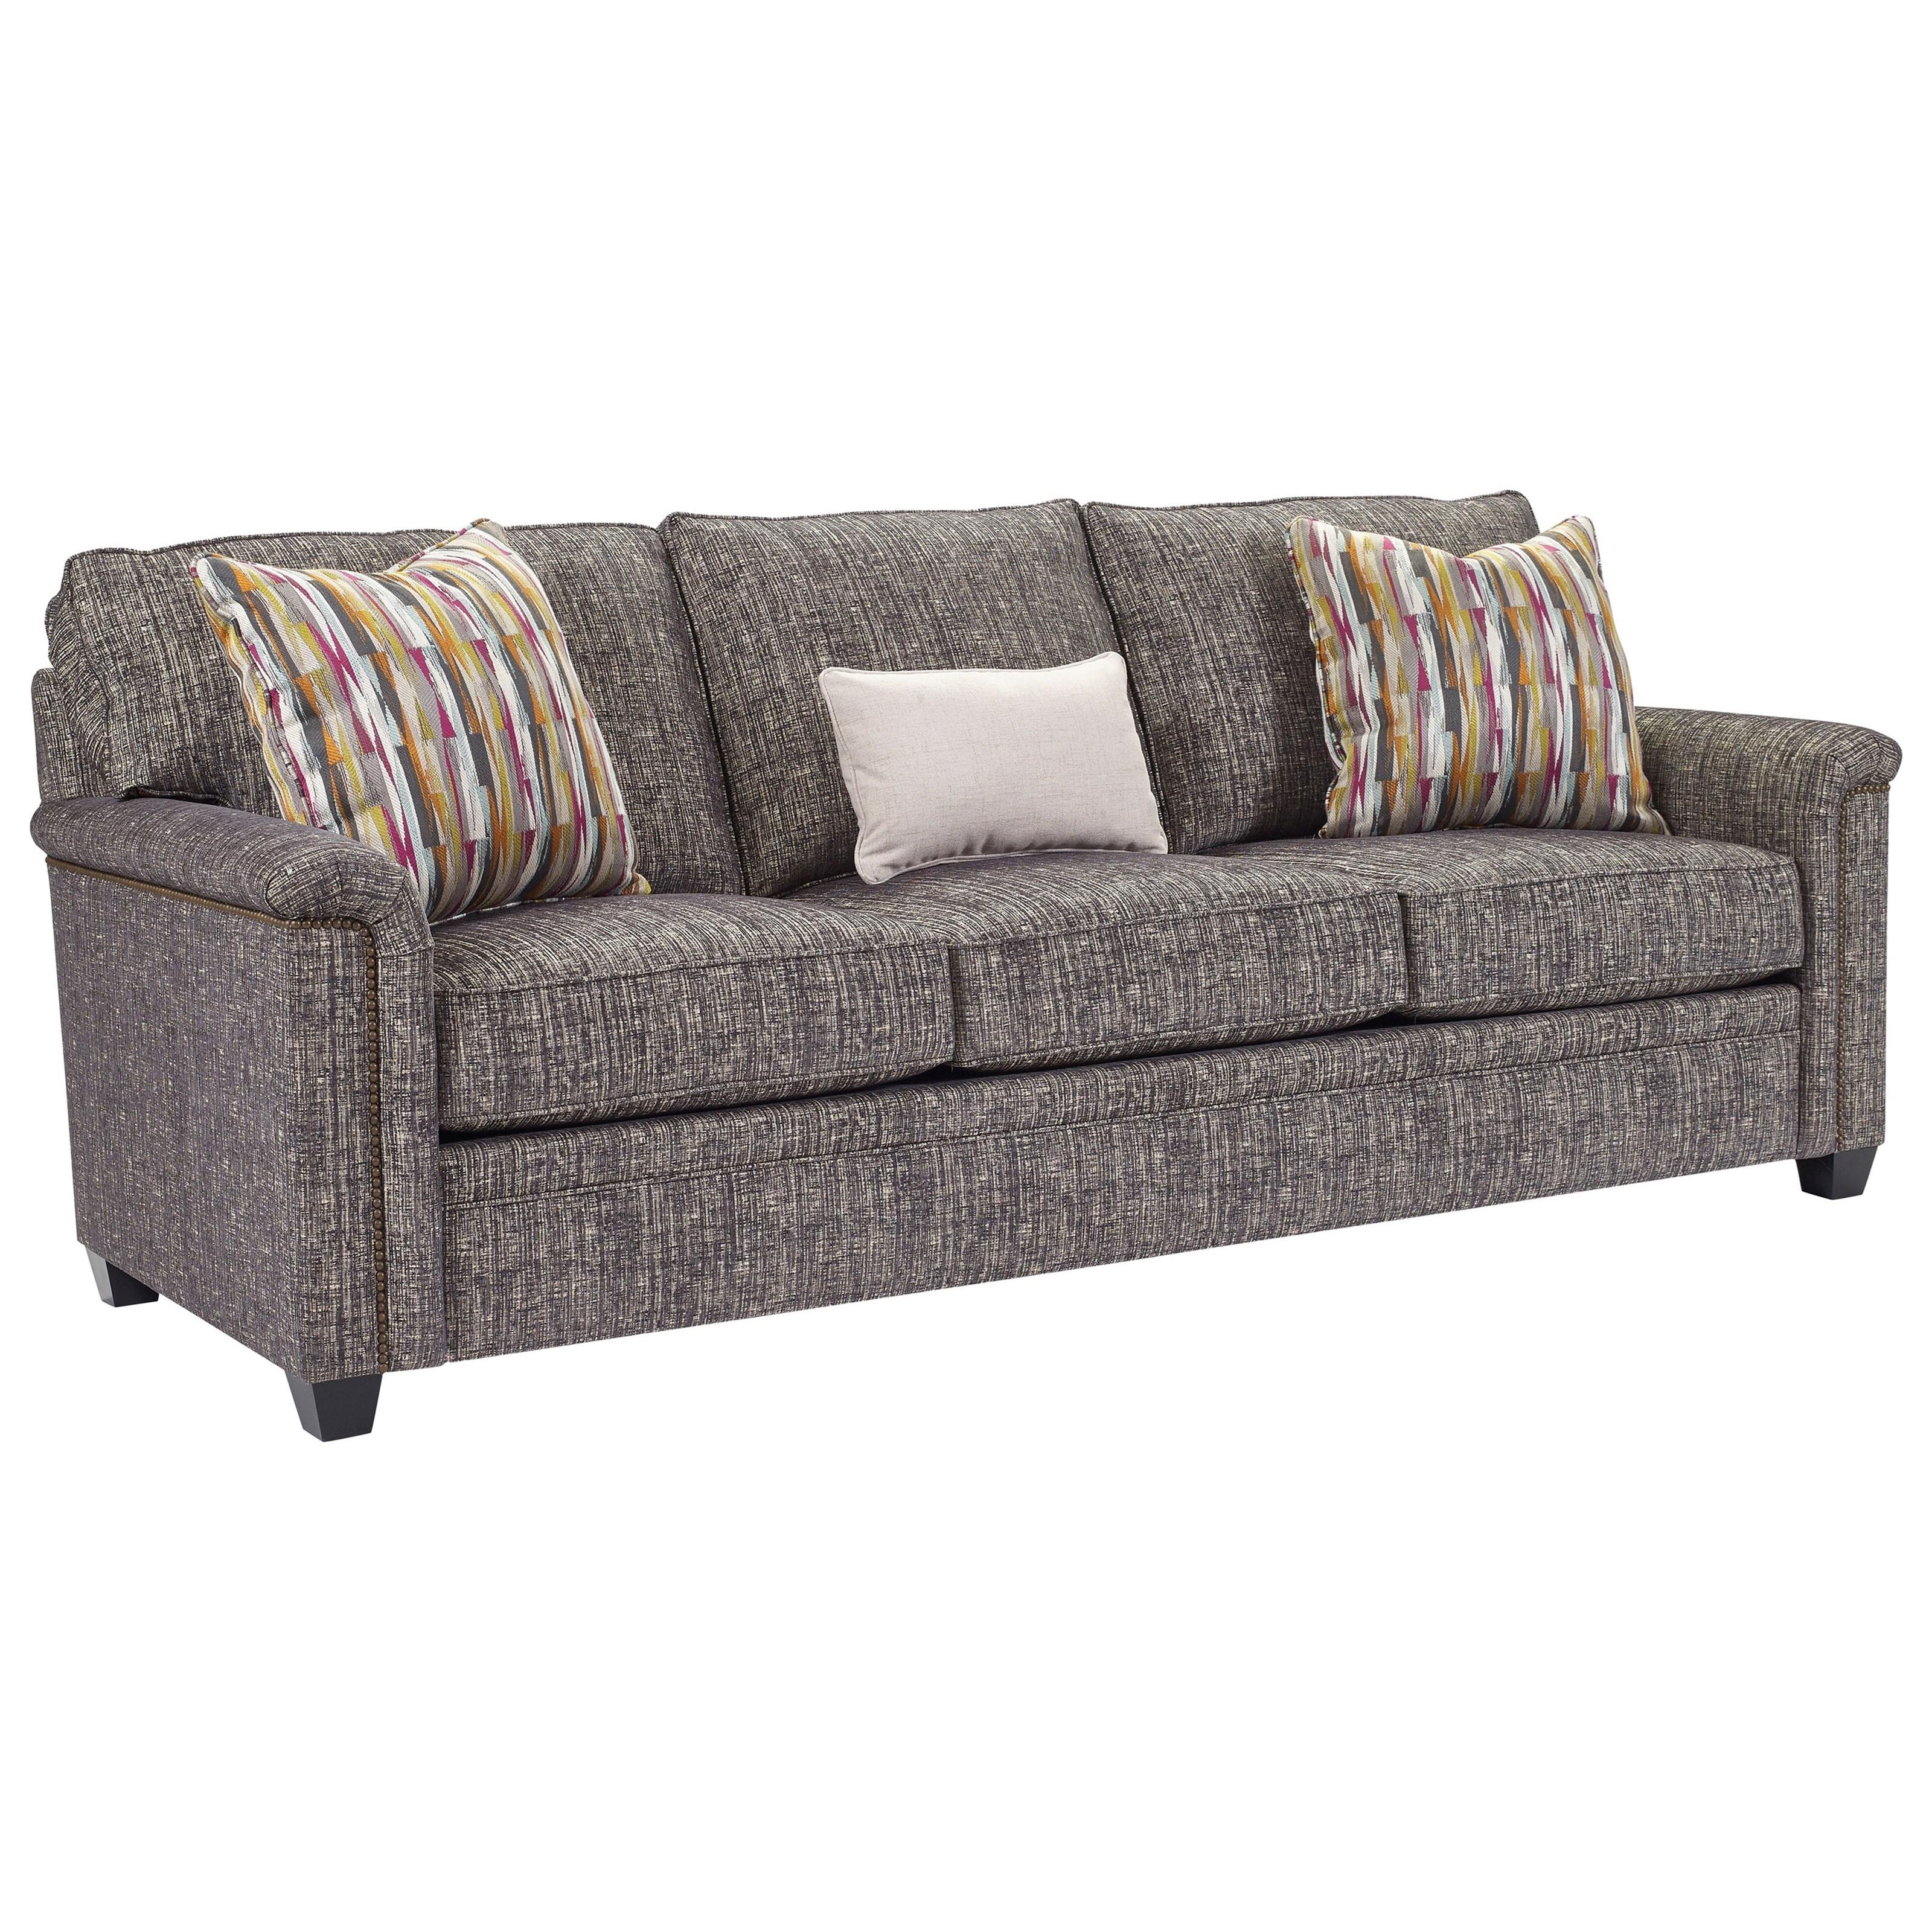 broyhill laramie sofa fabric home styles modern craftsman table choices fabrics 沙发和椅子